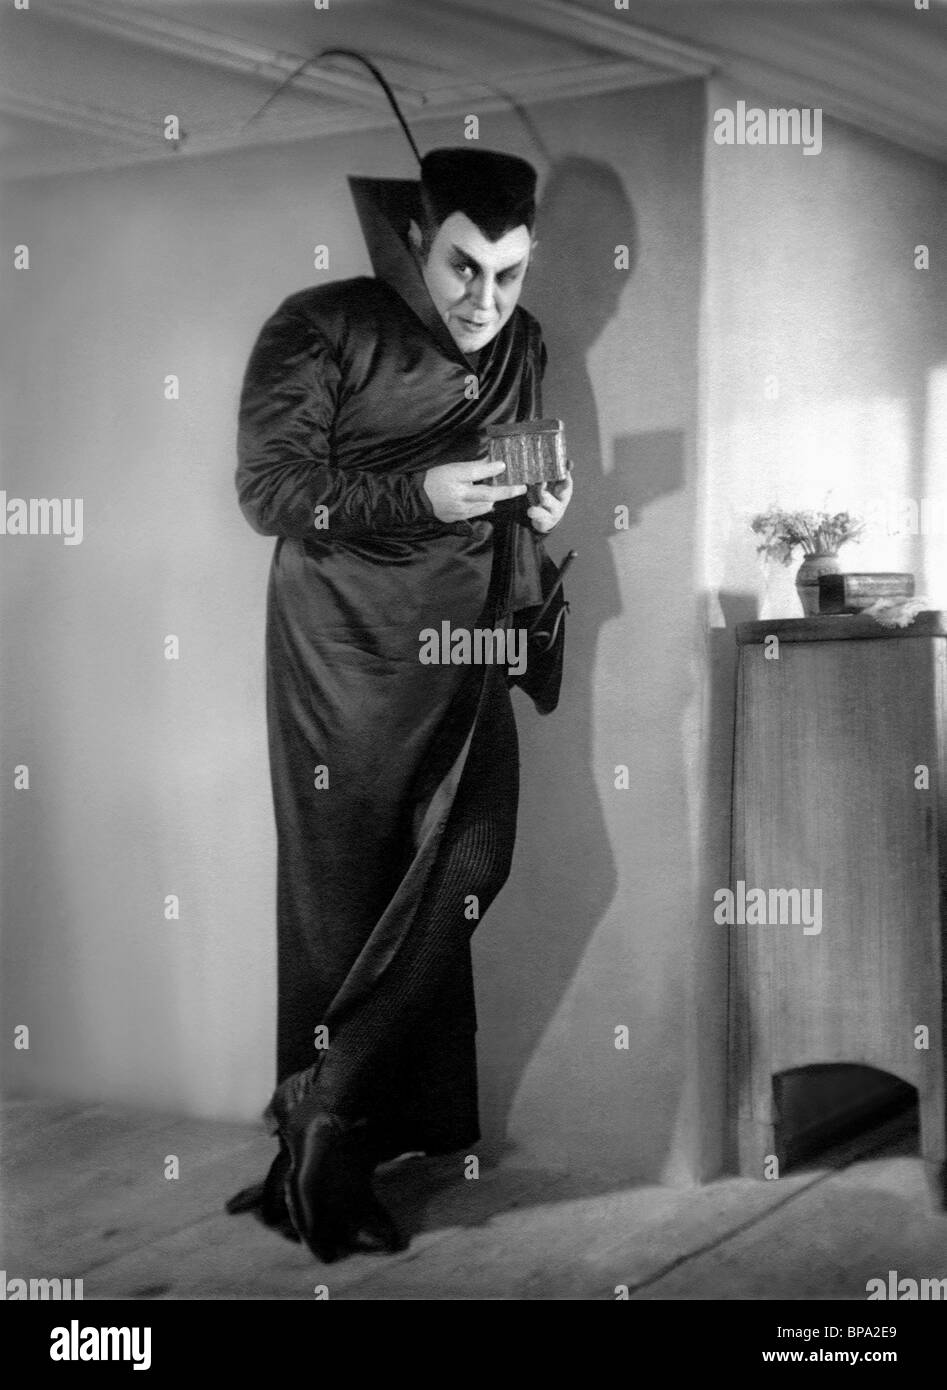 EMIL JANNINGS FAUST: A GERMAN FOLK LEGEND (1926) - Stock Image